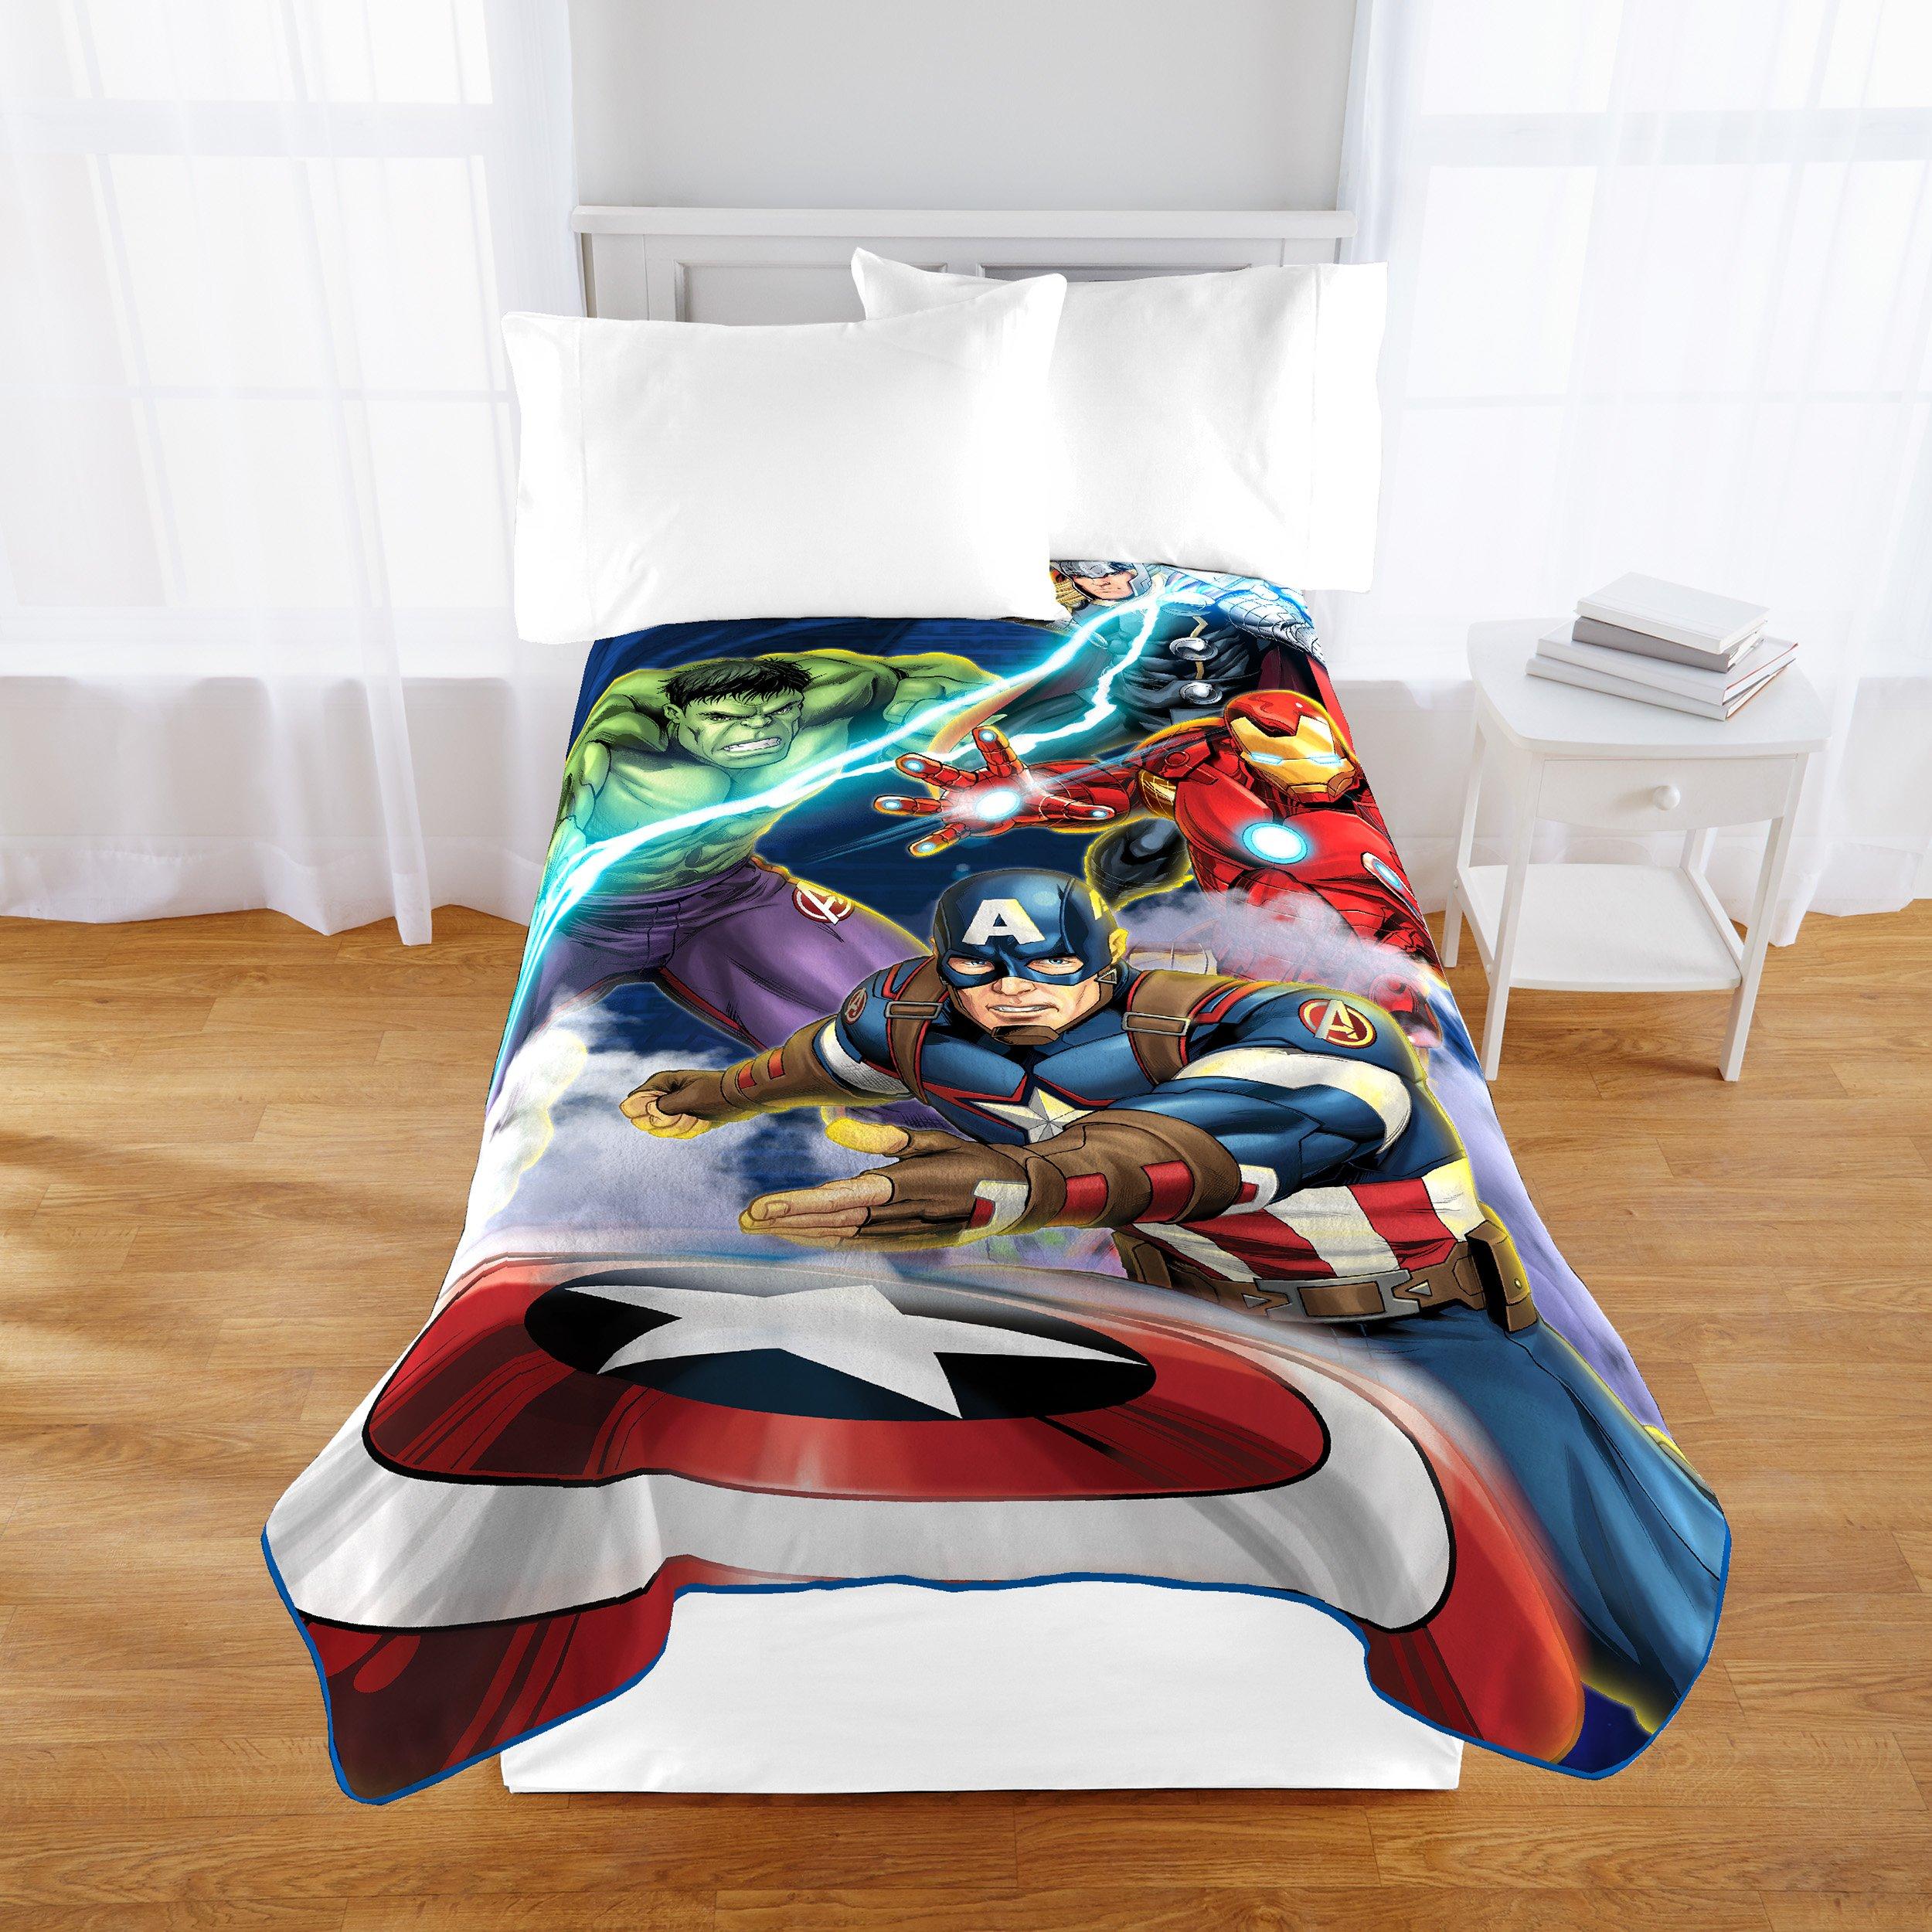 Marvel Avengers Blue Circle Fleece Plush Blanket, 62 x 90/Twin by Jay Franco (Image #2)